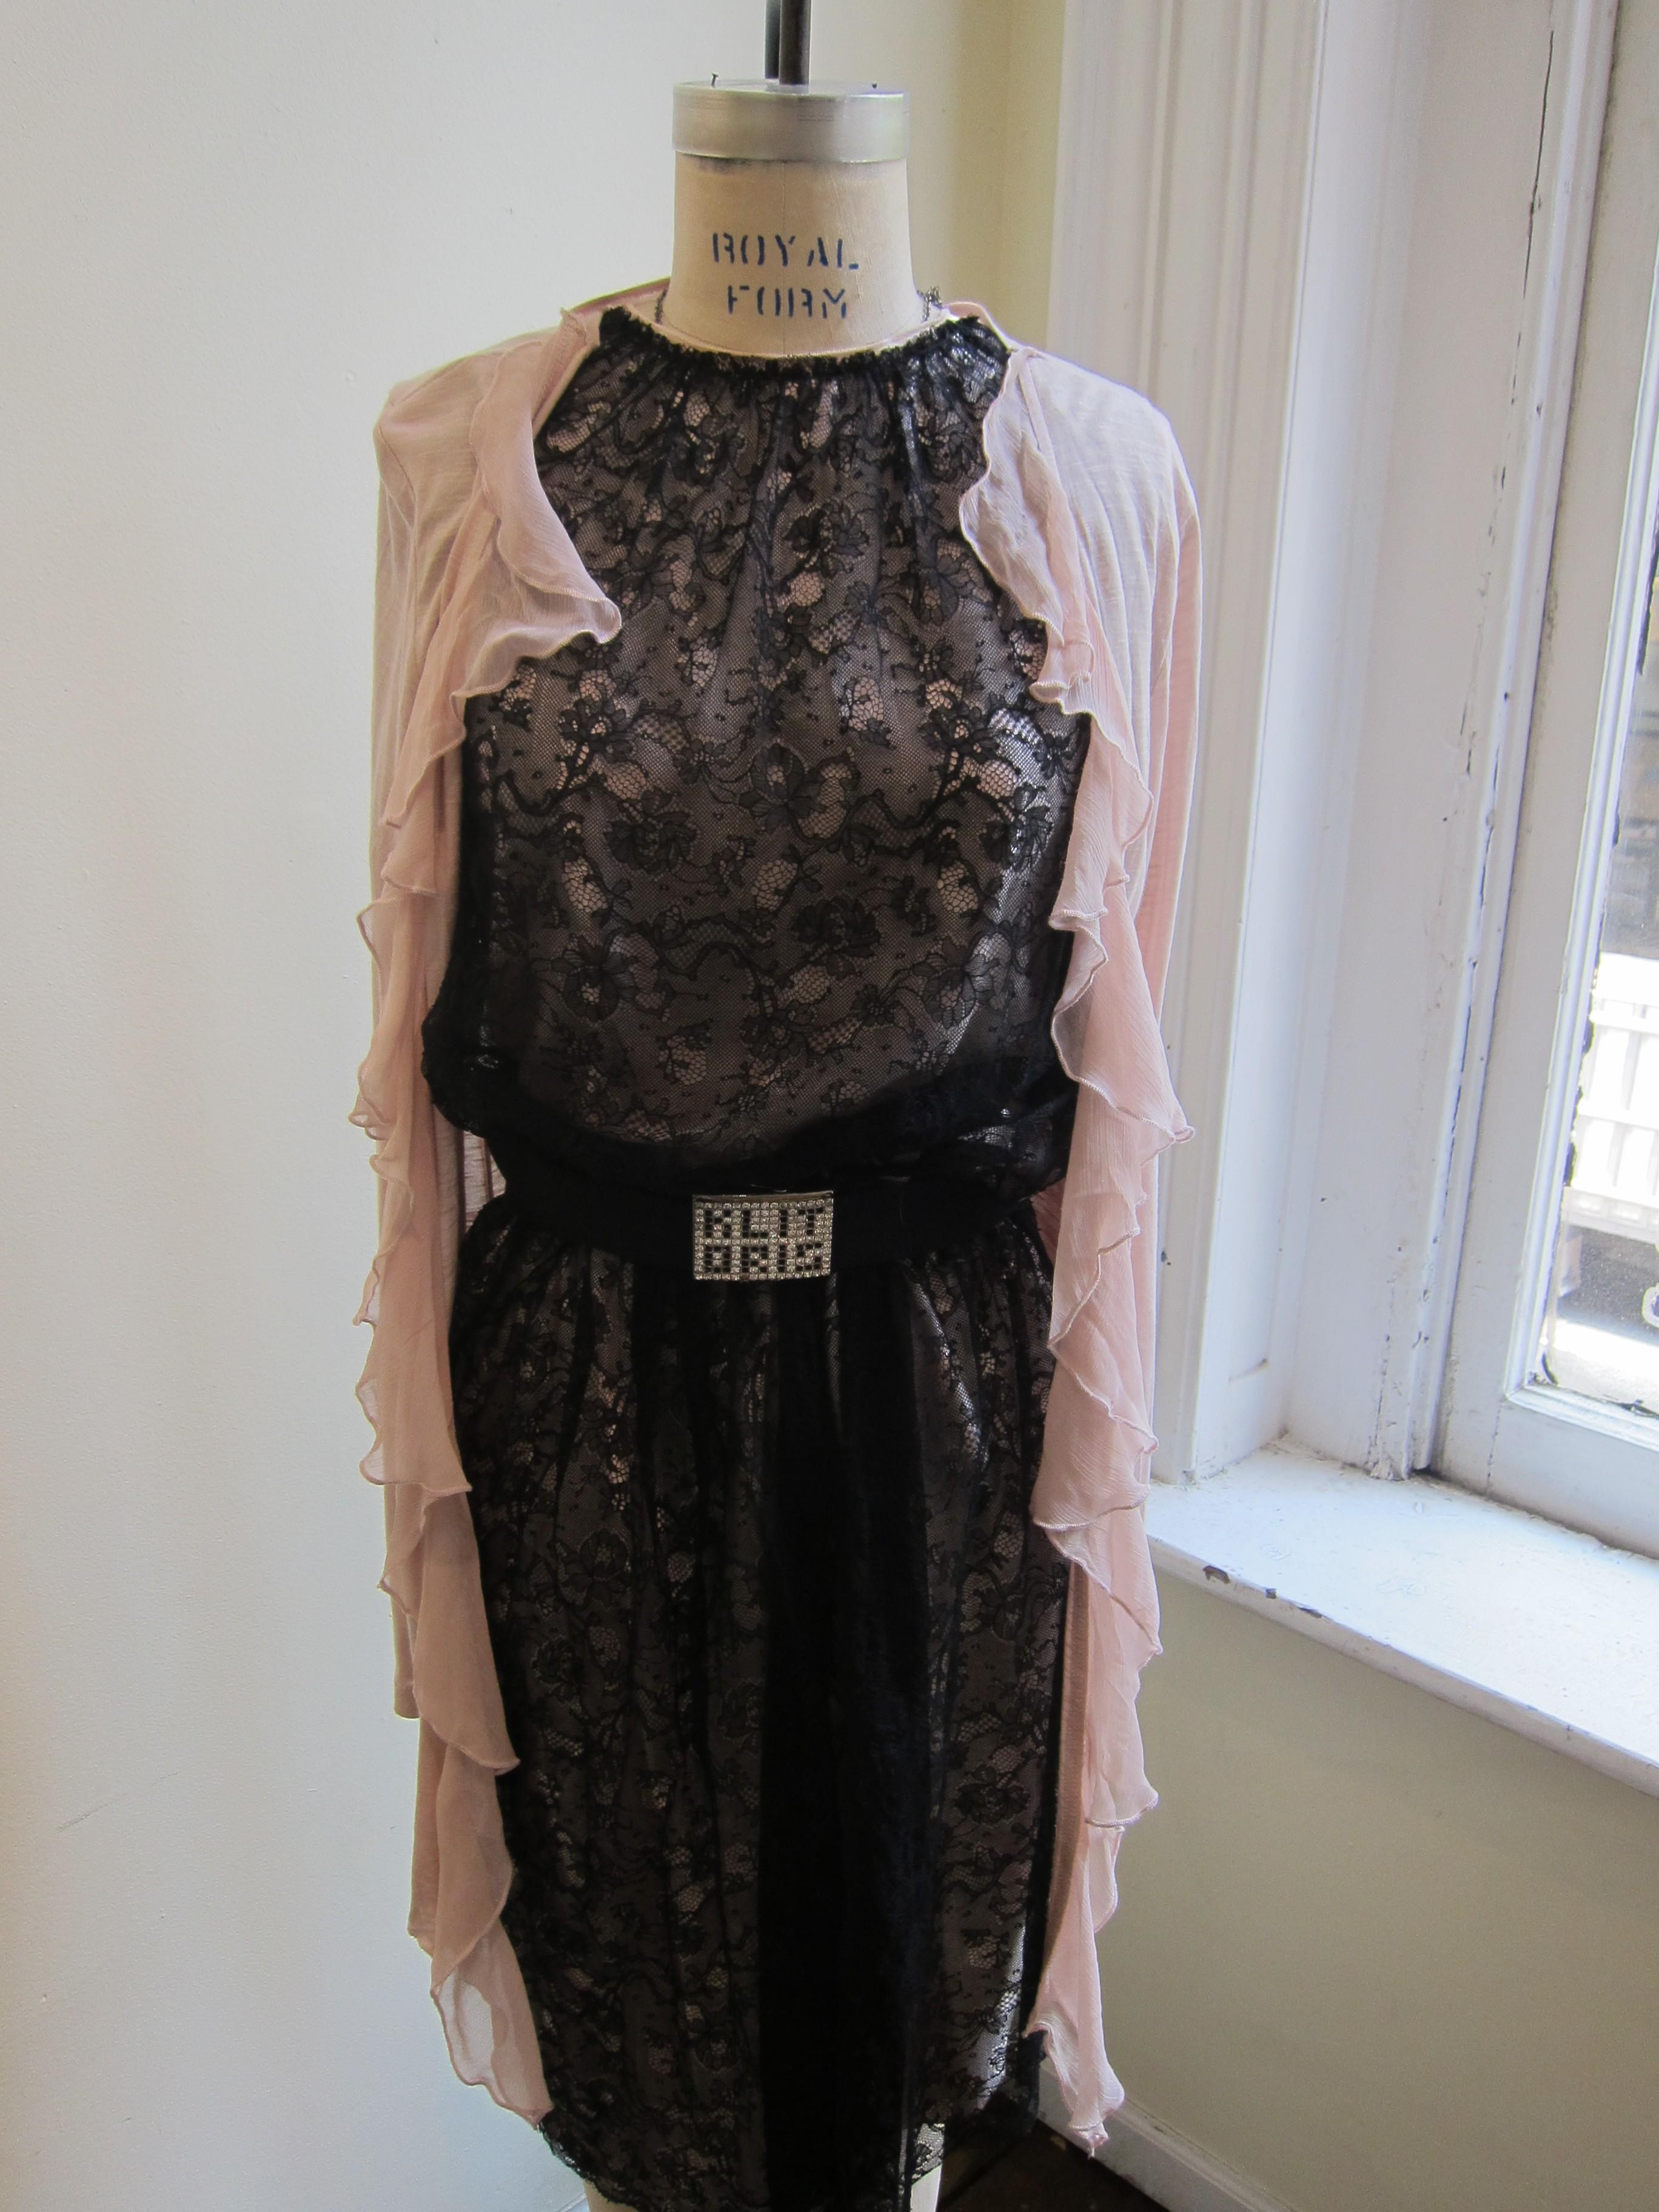 D g white lace dress h&m